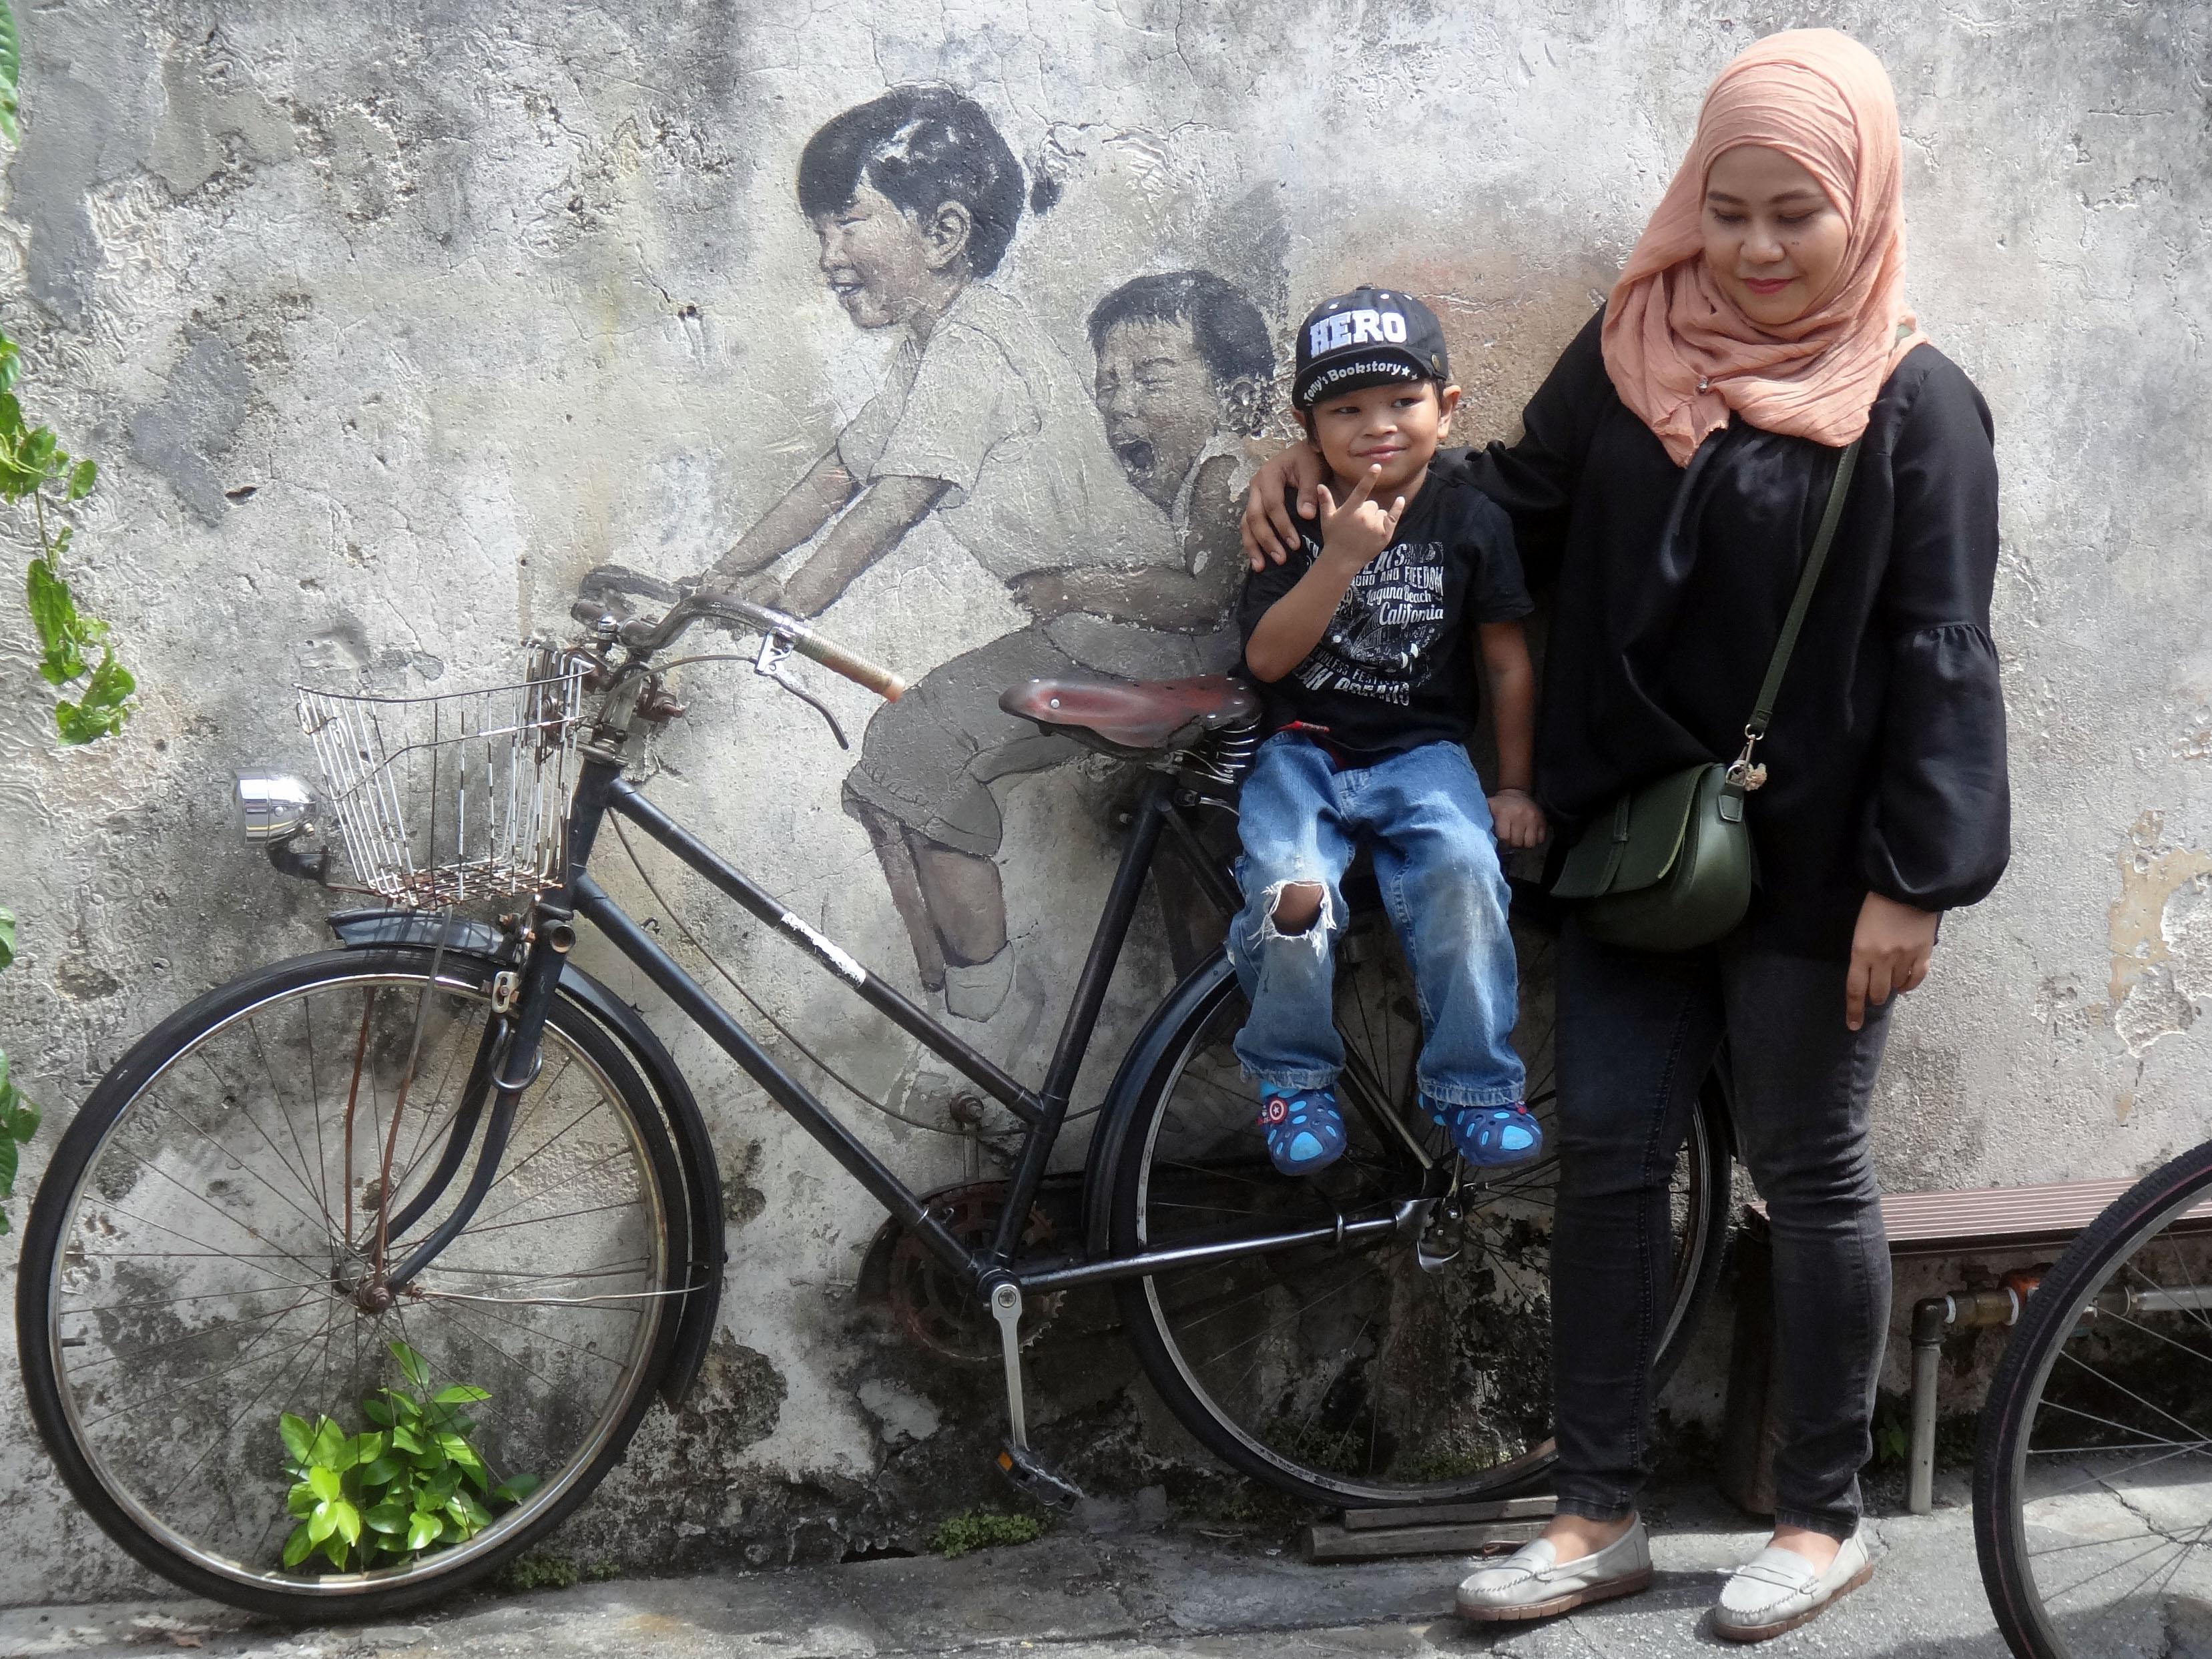 Kids on bicycle